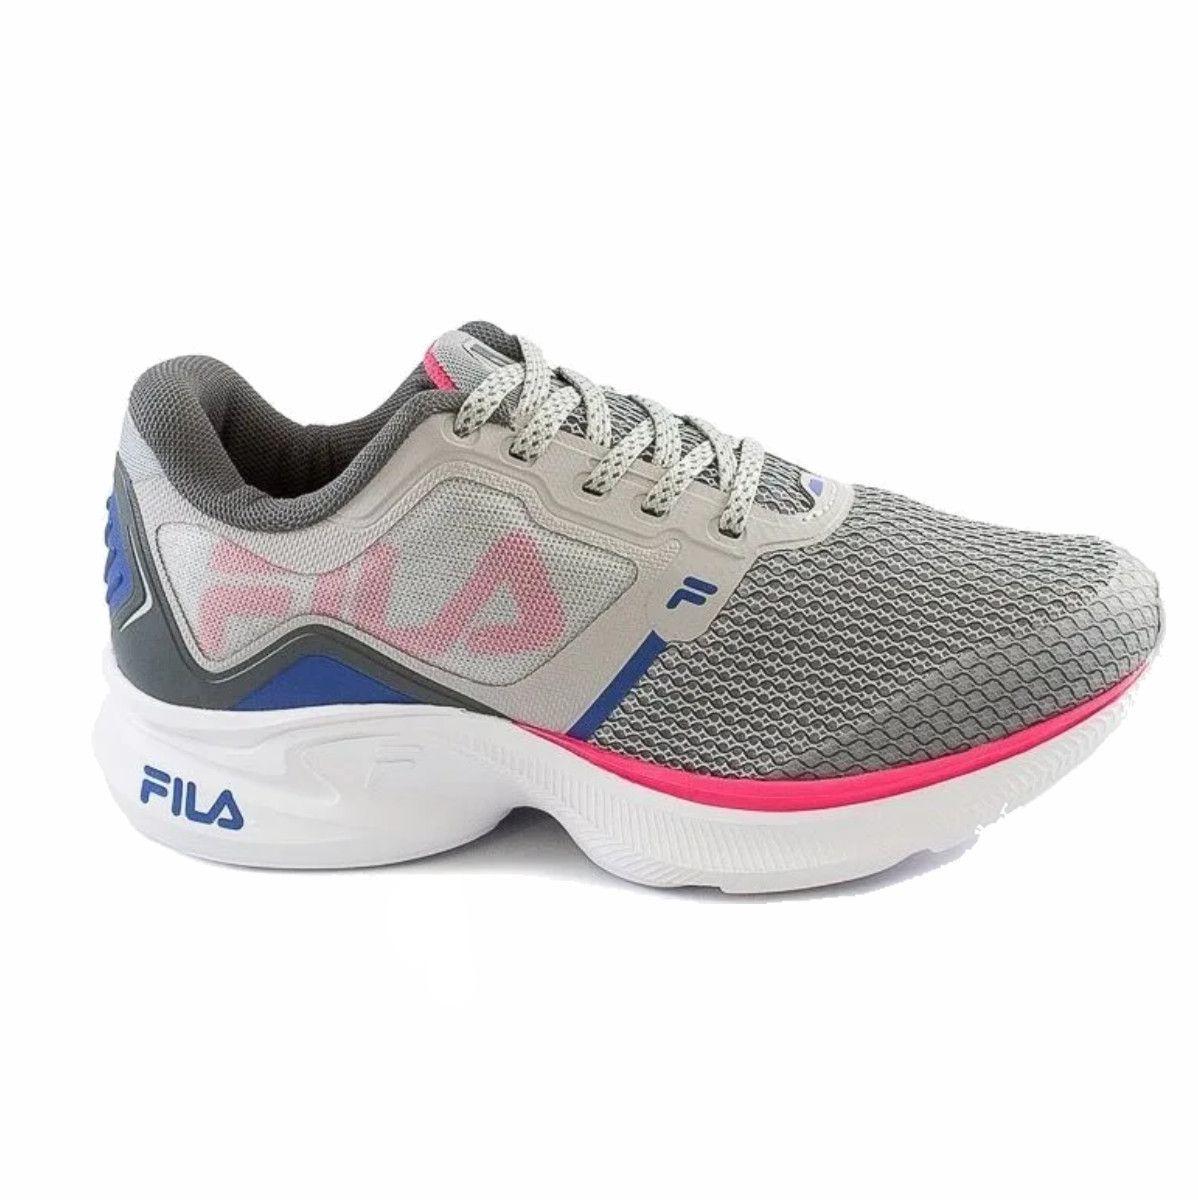 Tenis Fila Racer Move Feminino Running Training